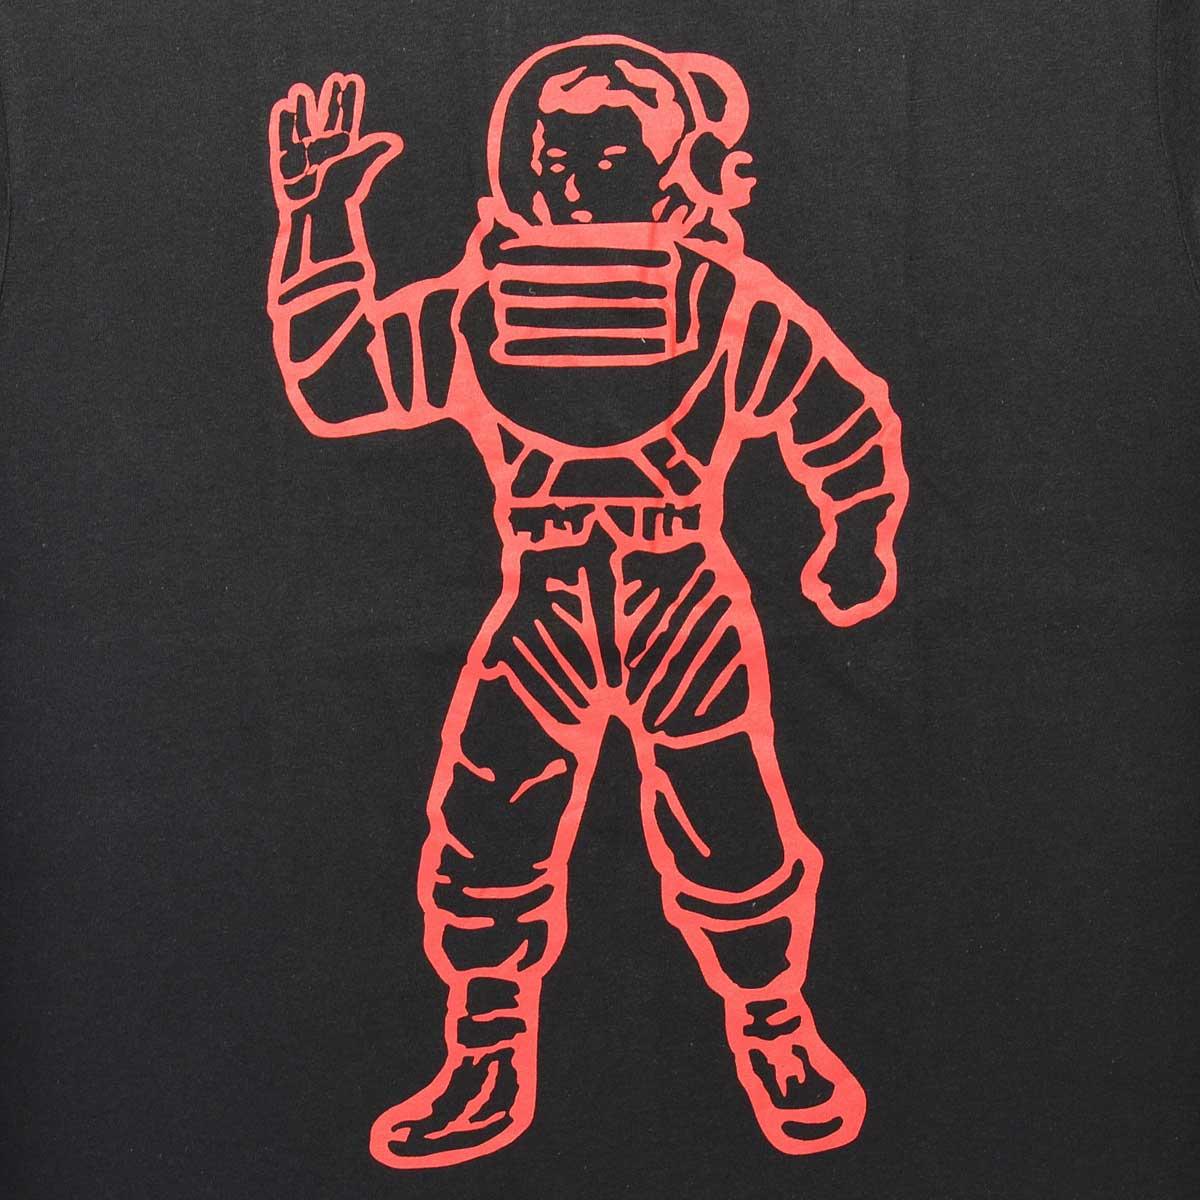 Billionaire Boys Club Astronaut Wallpaper Billionaire boys club 1200x1200